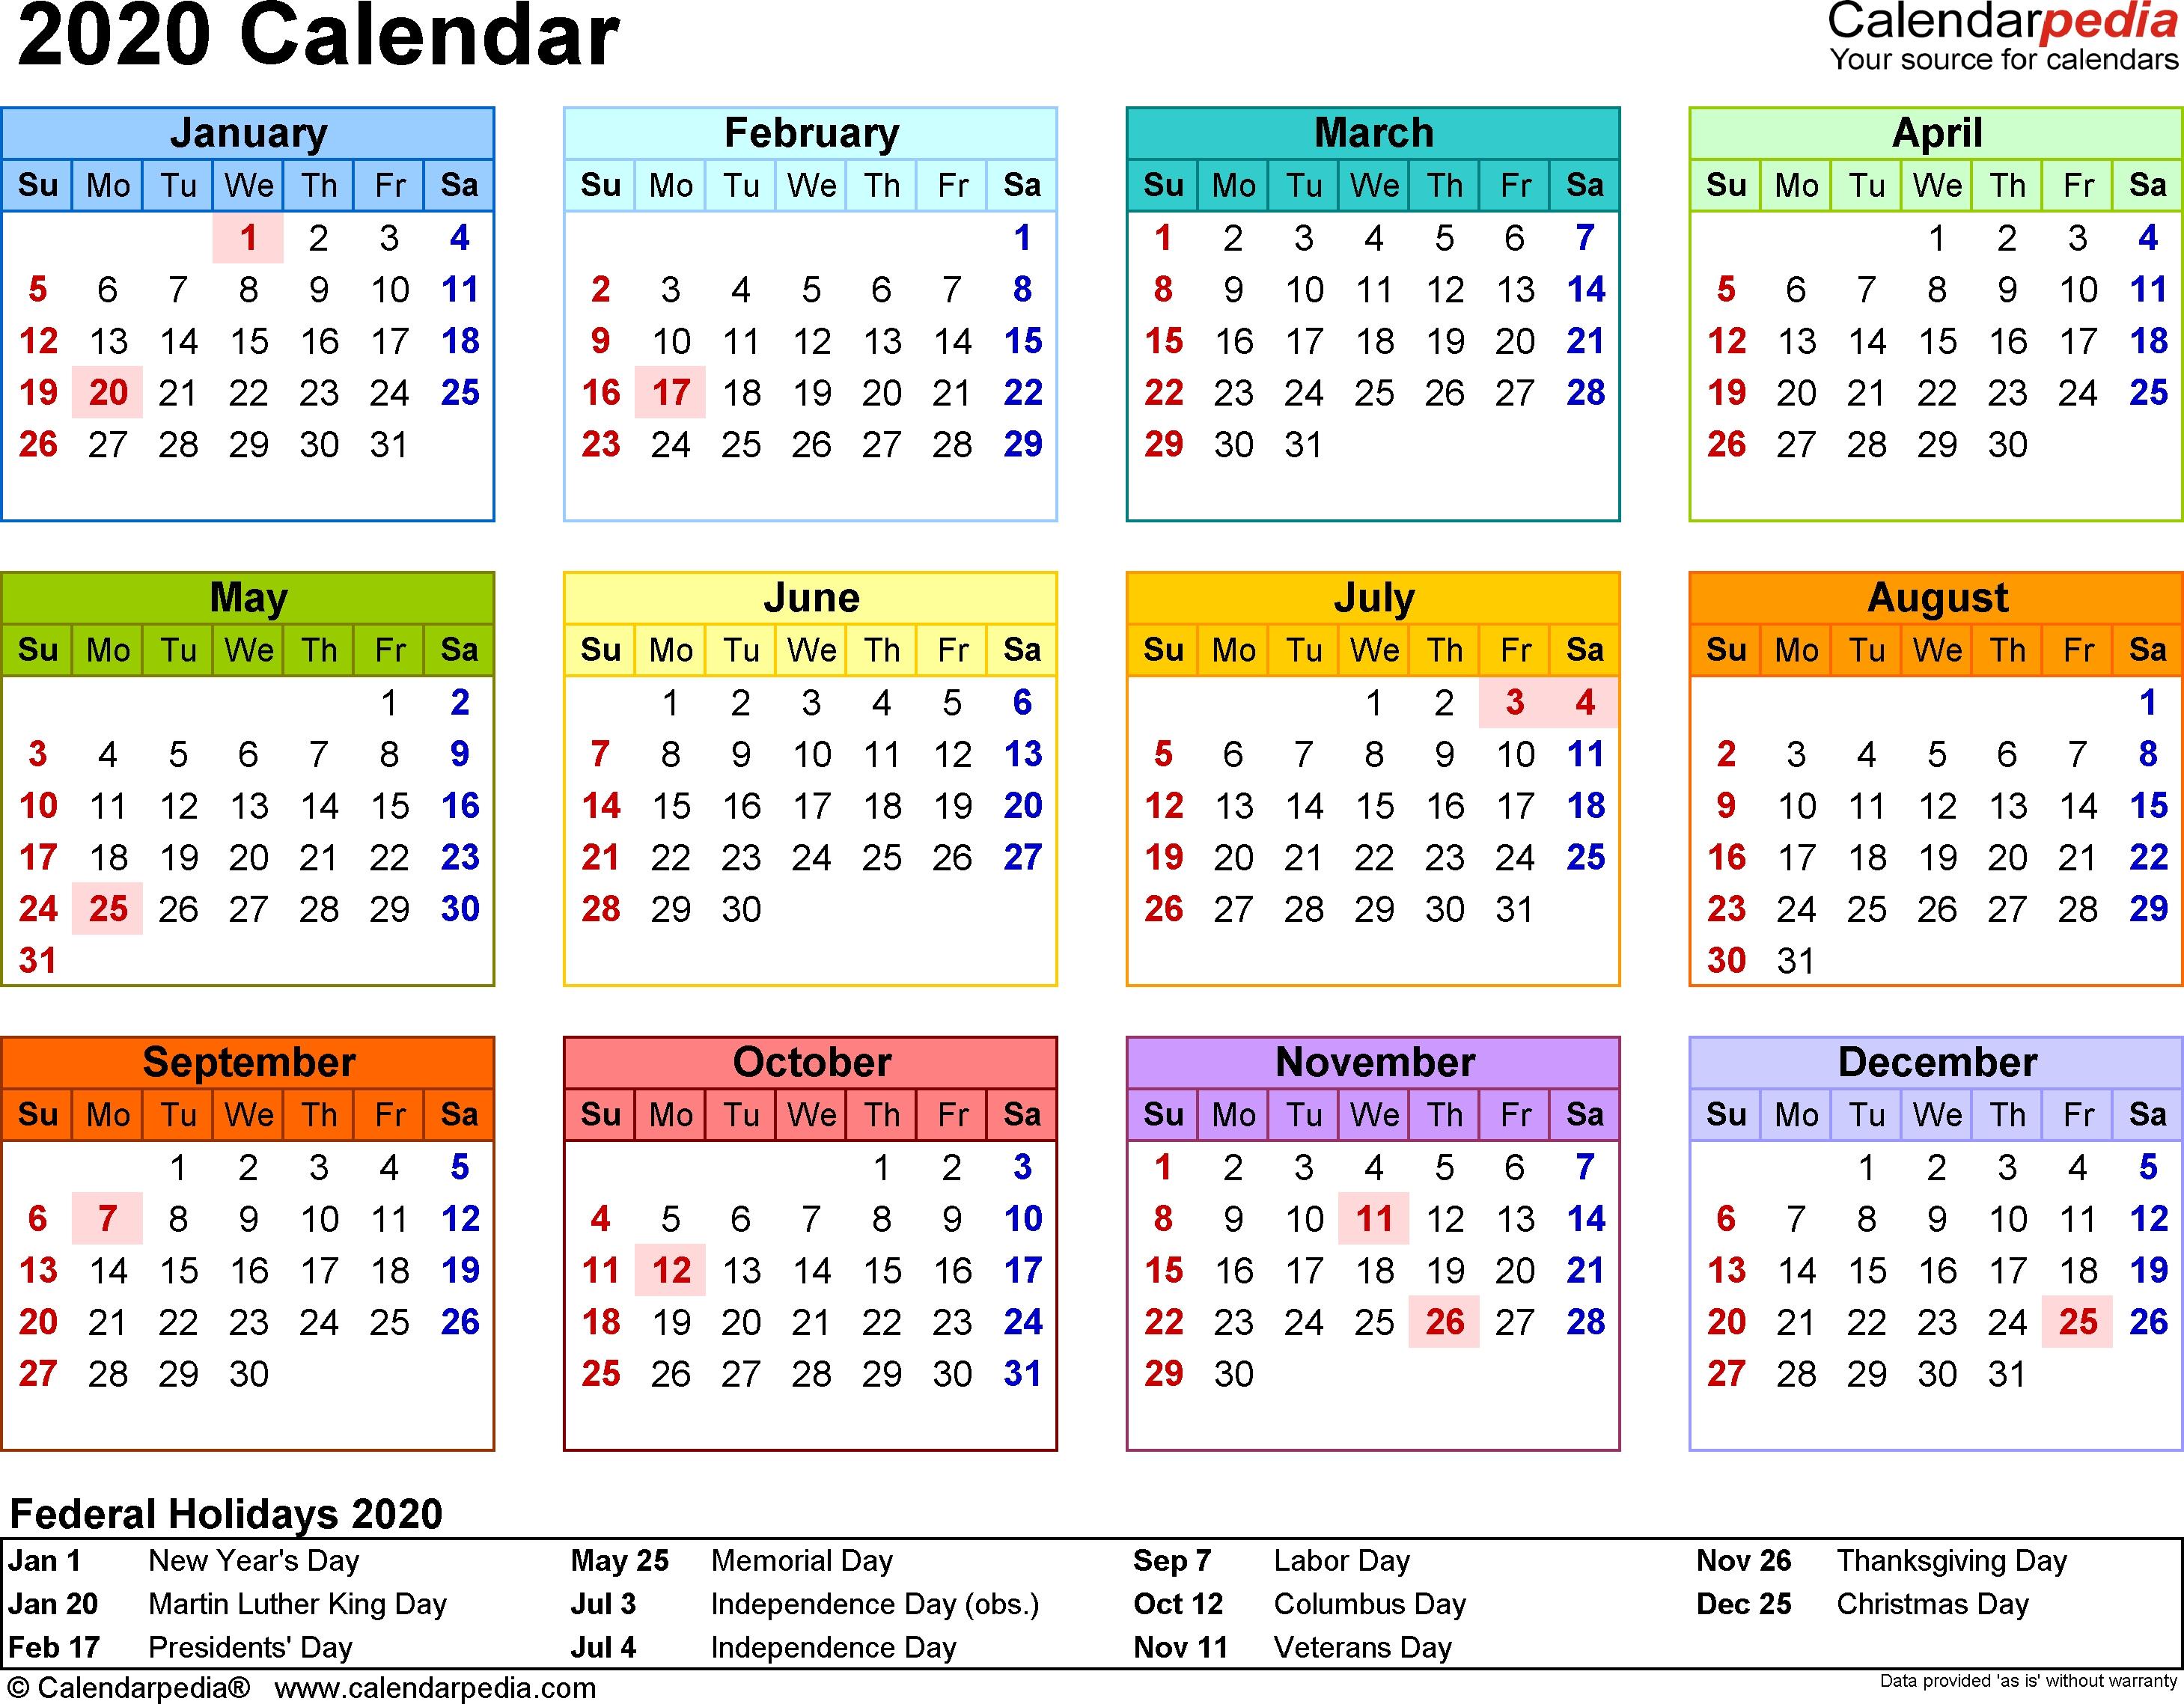 2020 Calendar - Download 18 Free Printable Excel Templates-2022 Calendar Printable With Holidays Malaysia